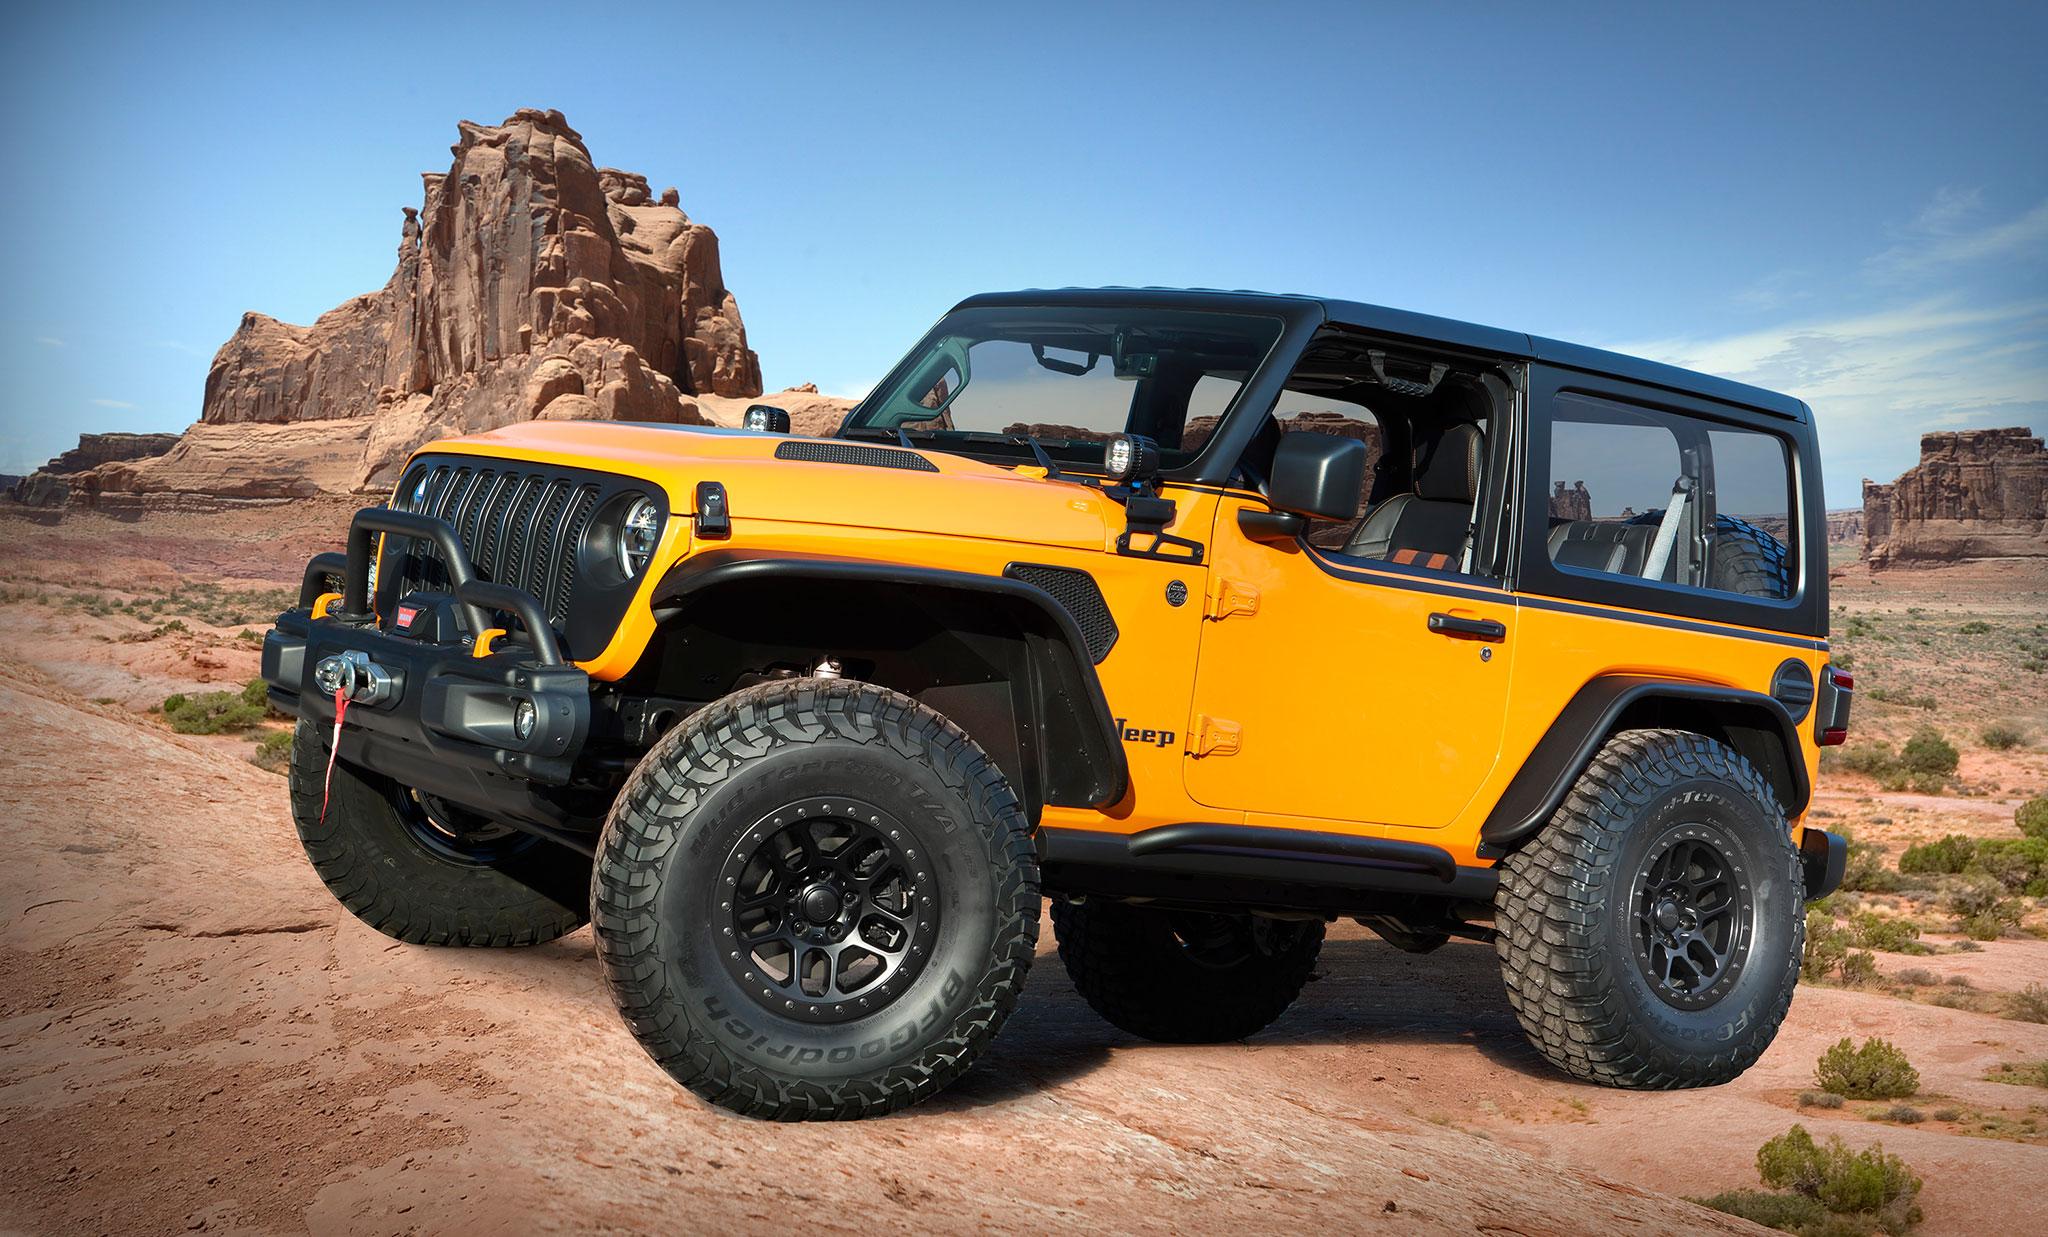 2021 Jeep Wrangler 2-Door Orange Peelz trois quarts avant gauche - Concept Cars de Jeep®.